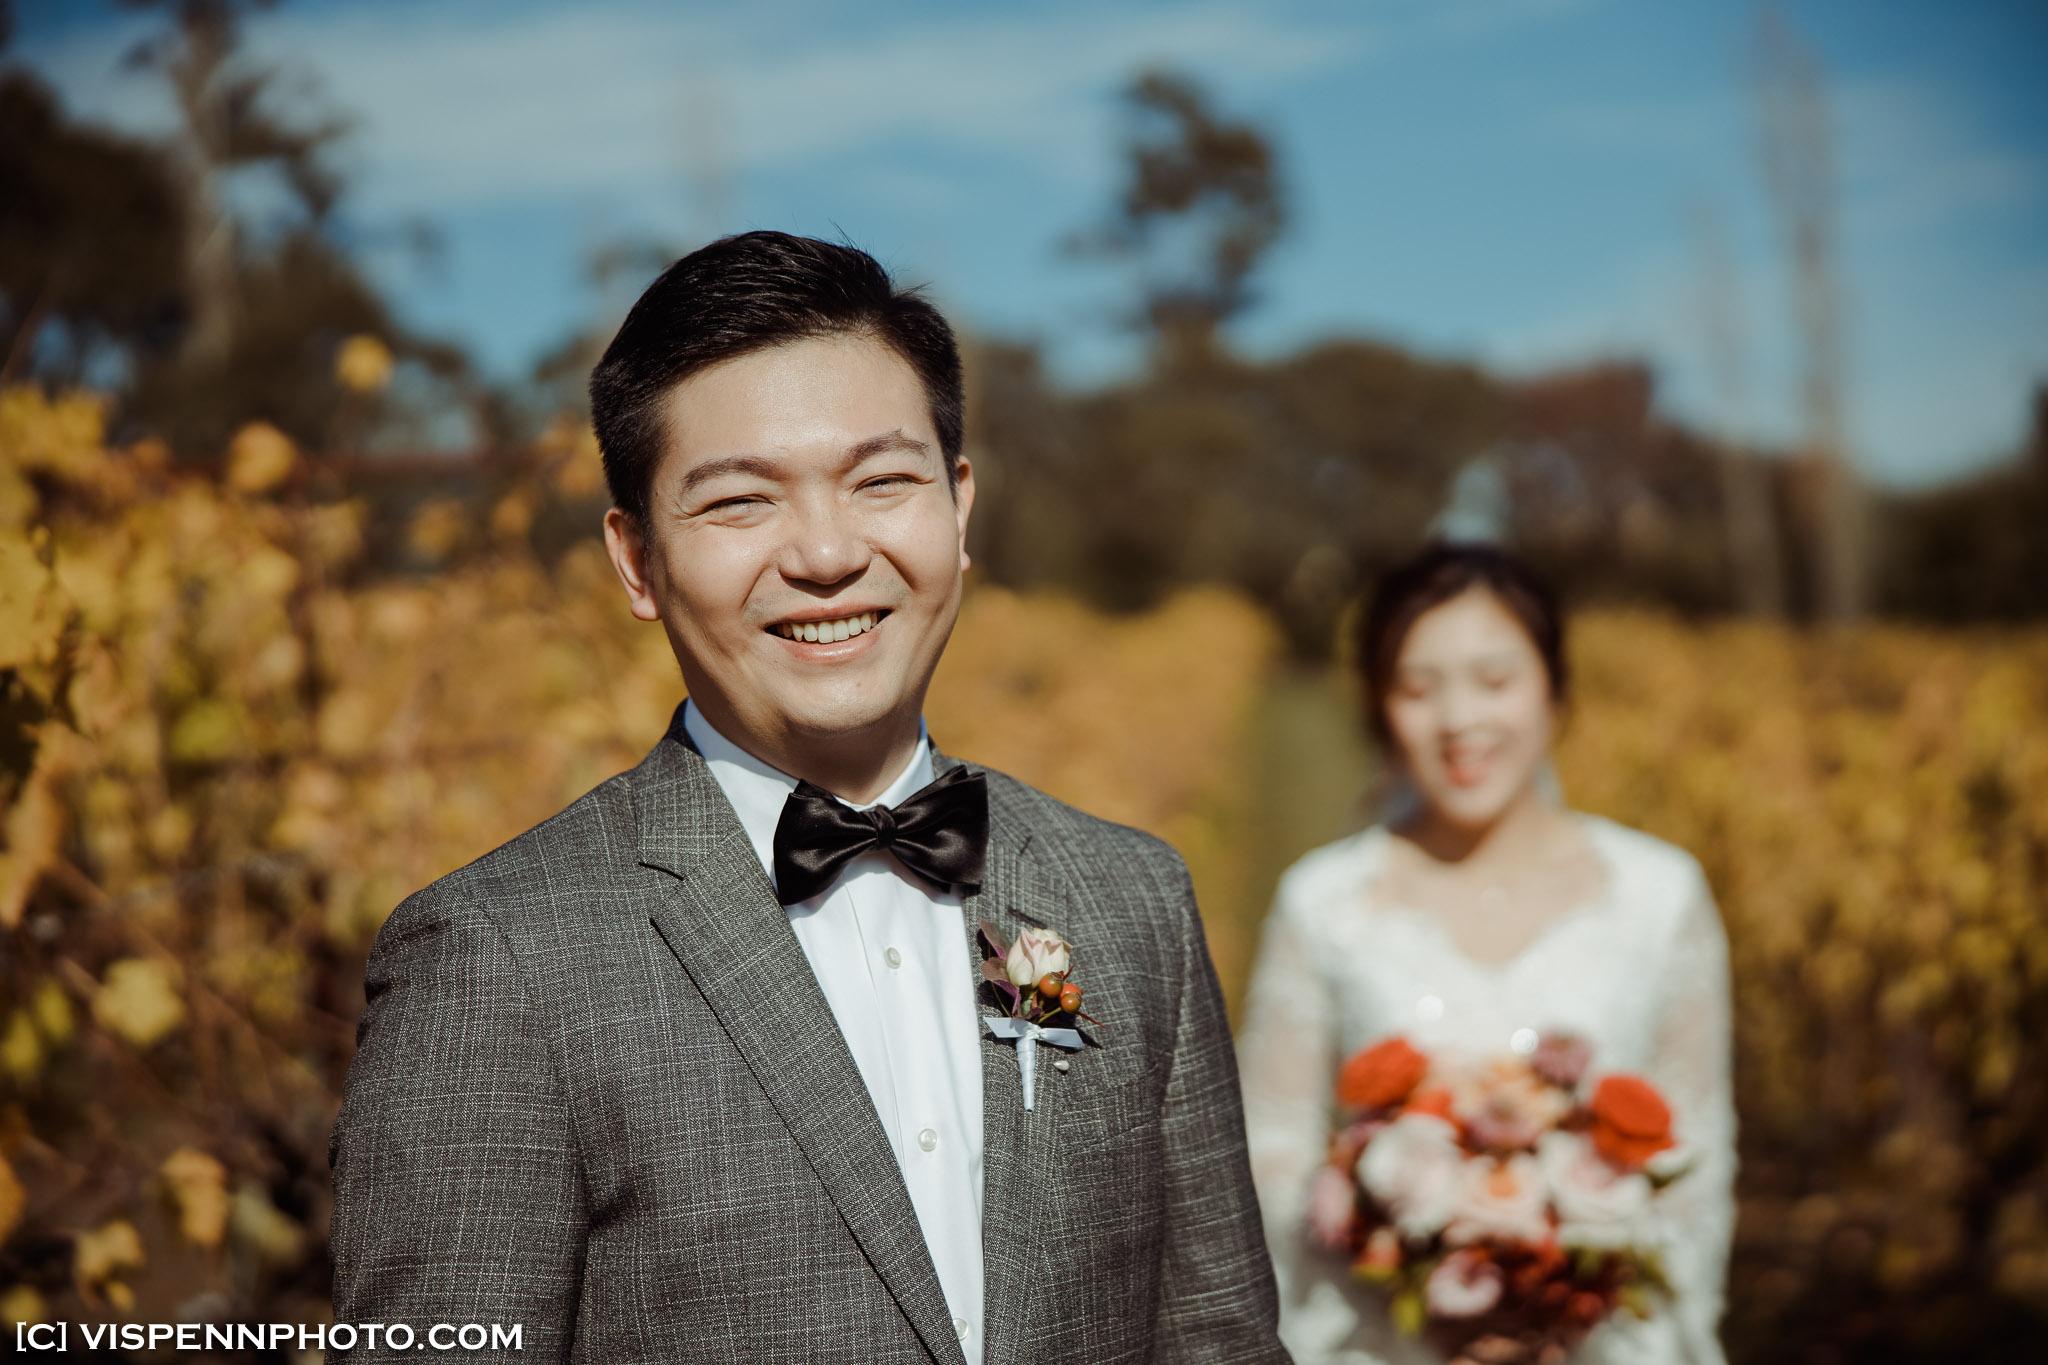 WEDDING DAY Photography Melbourne VISPENN 墨尔本 婚礼跟拍 婚礼摄像 婚礼摄影 结婚照 登记照 DominicHelen 1P 3521 EOSR VISPENN